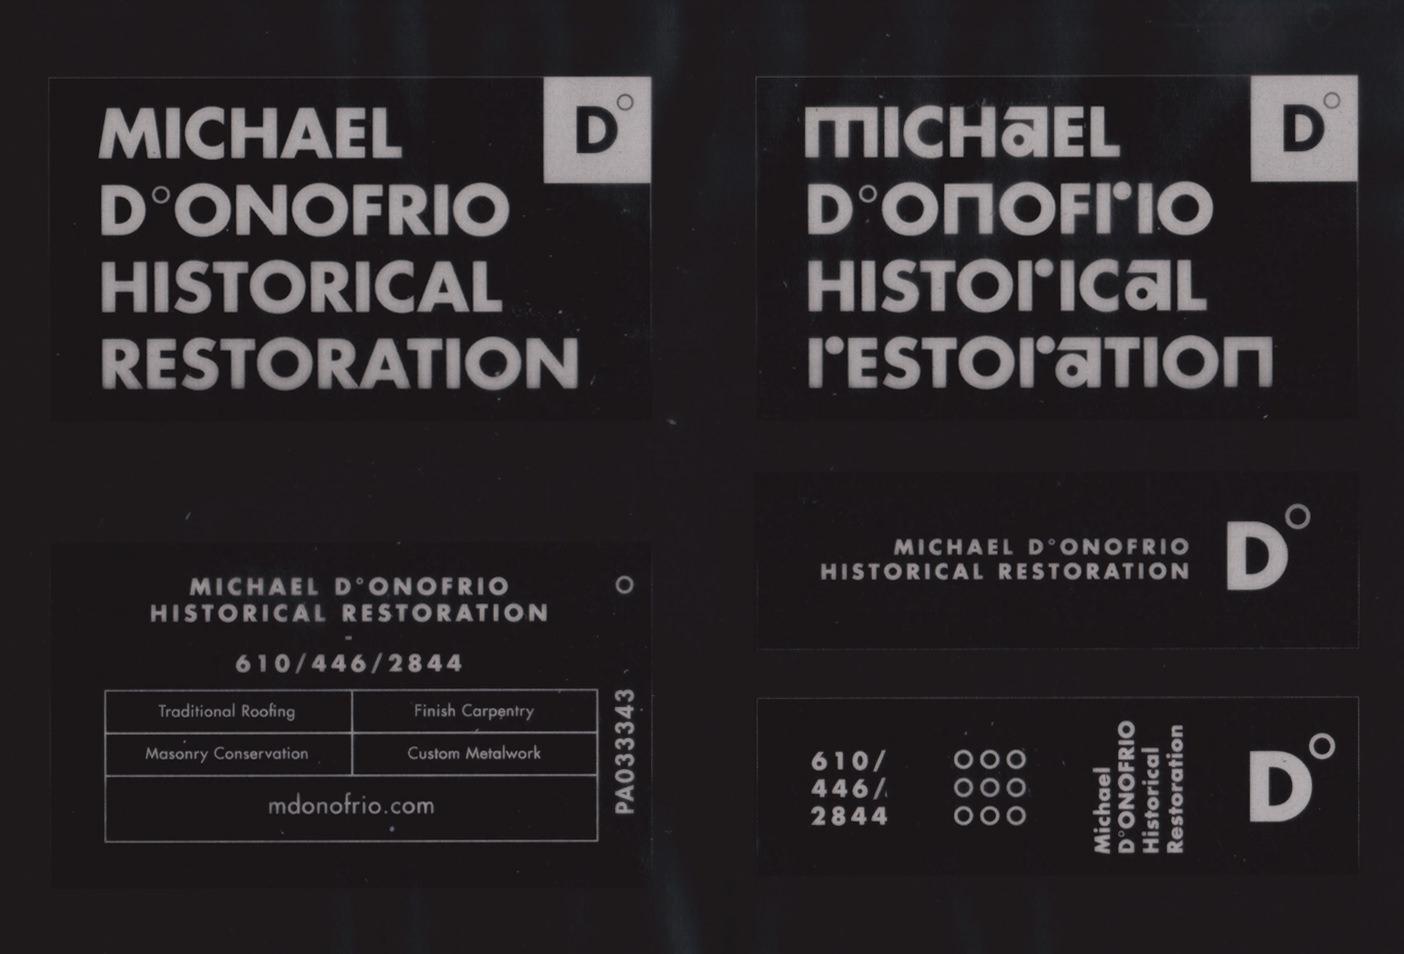 michael-donofrio-philadelphia-branding-vacaliebres-bcards